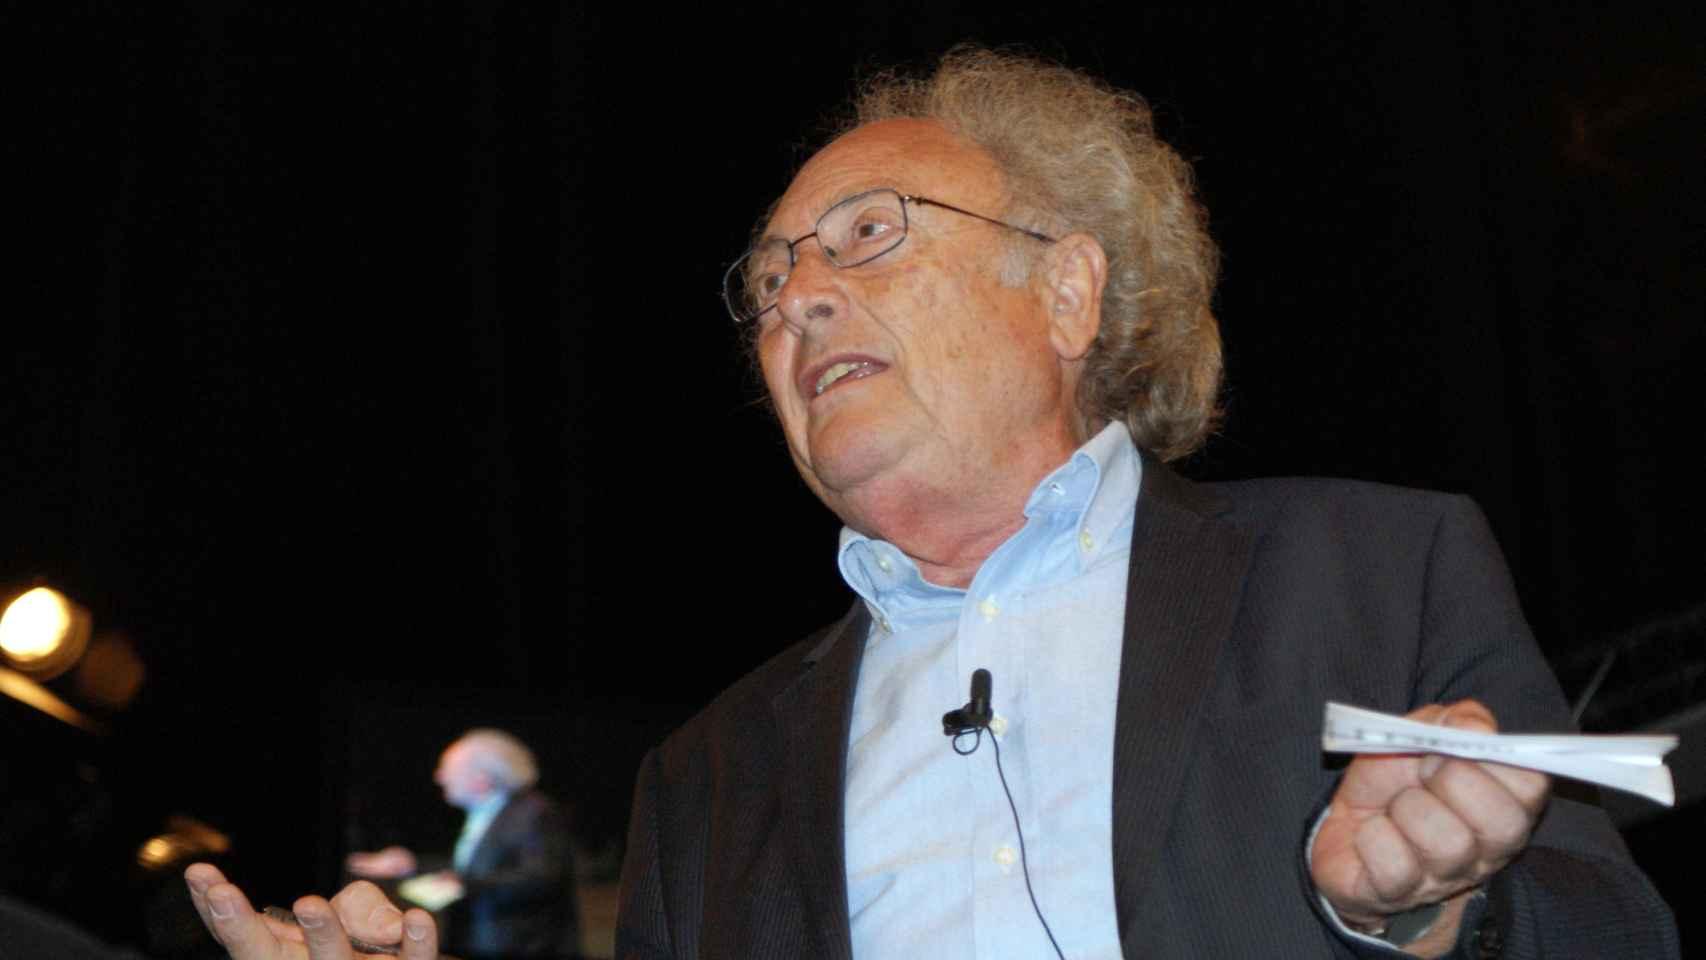 Punset, en un congreso en 2011.